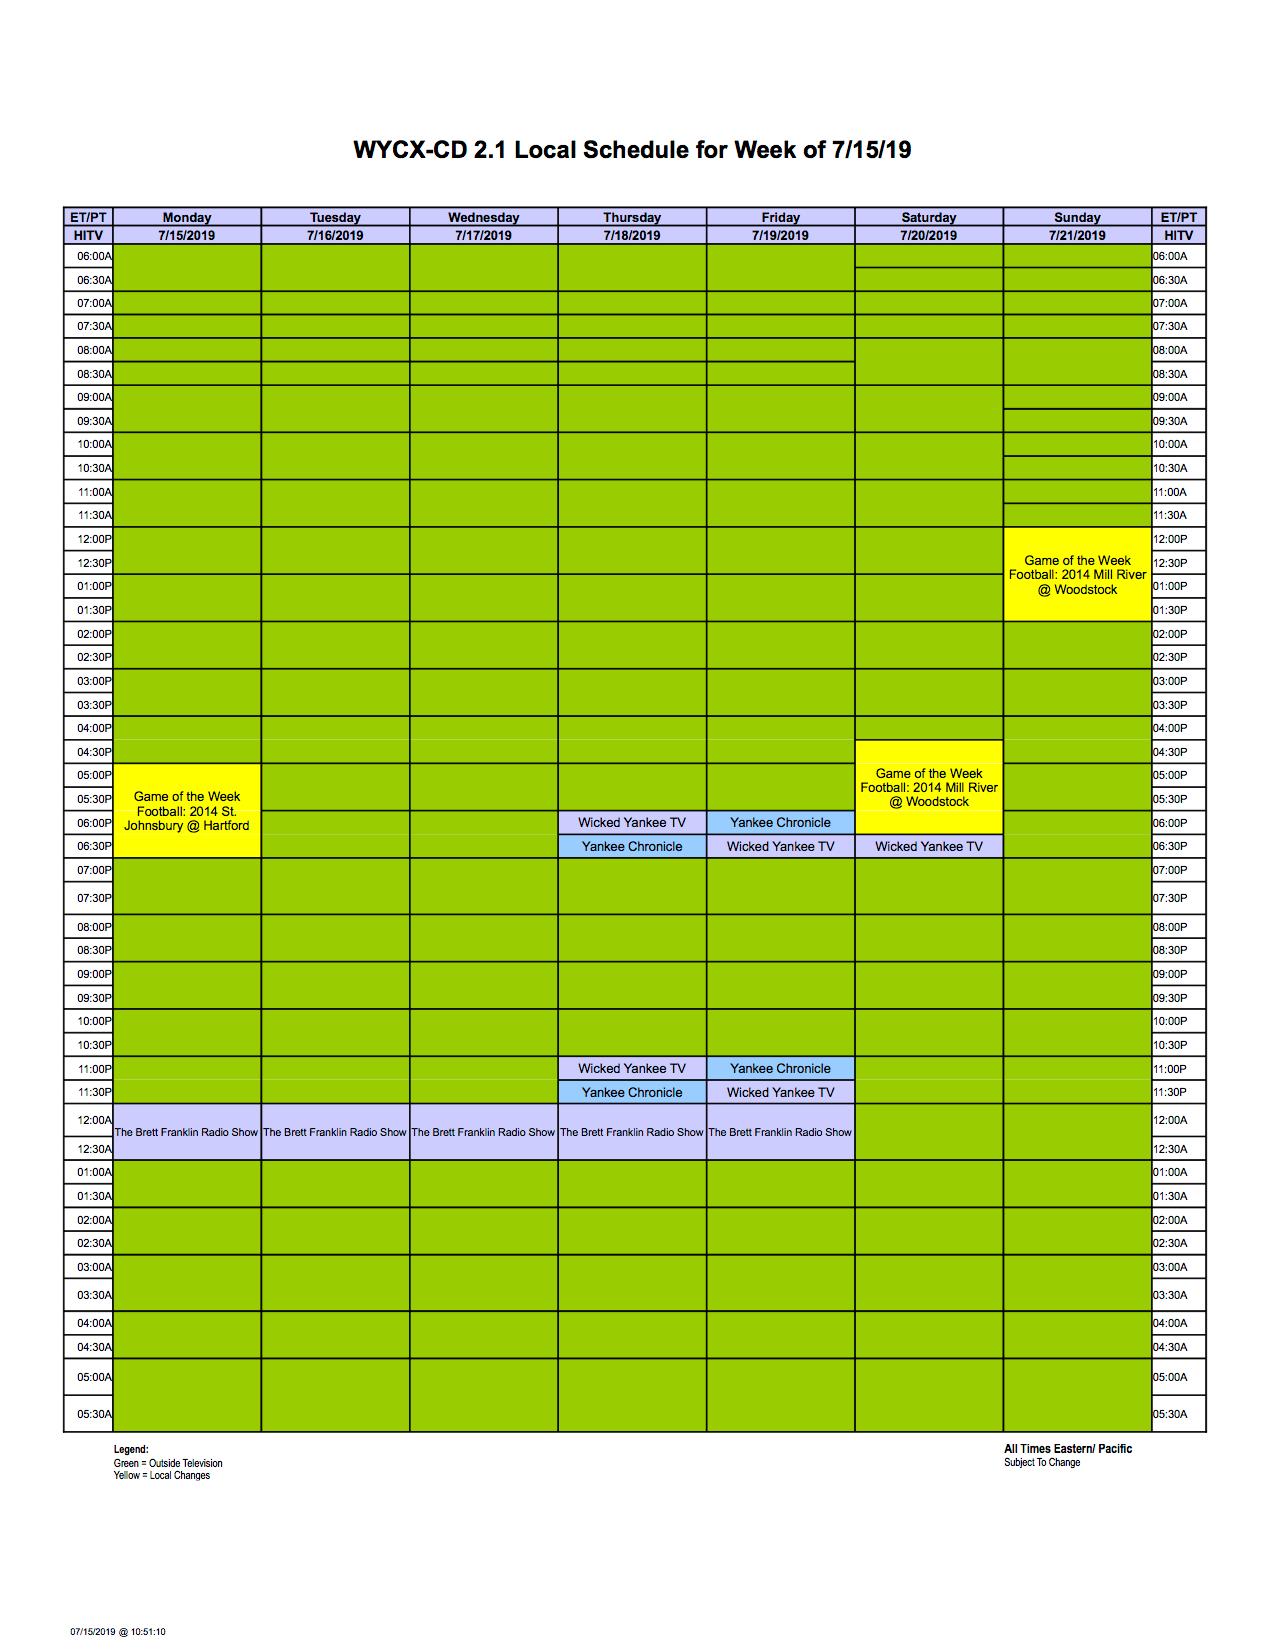 wycx_otv-local-07.15.19